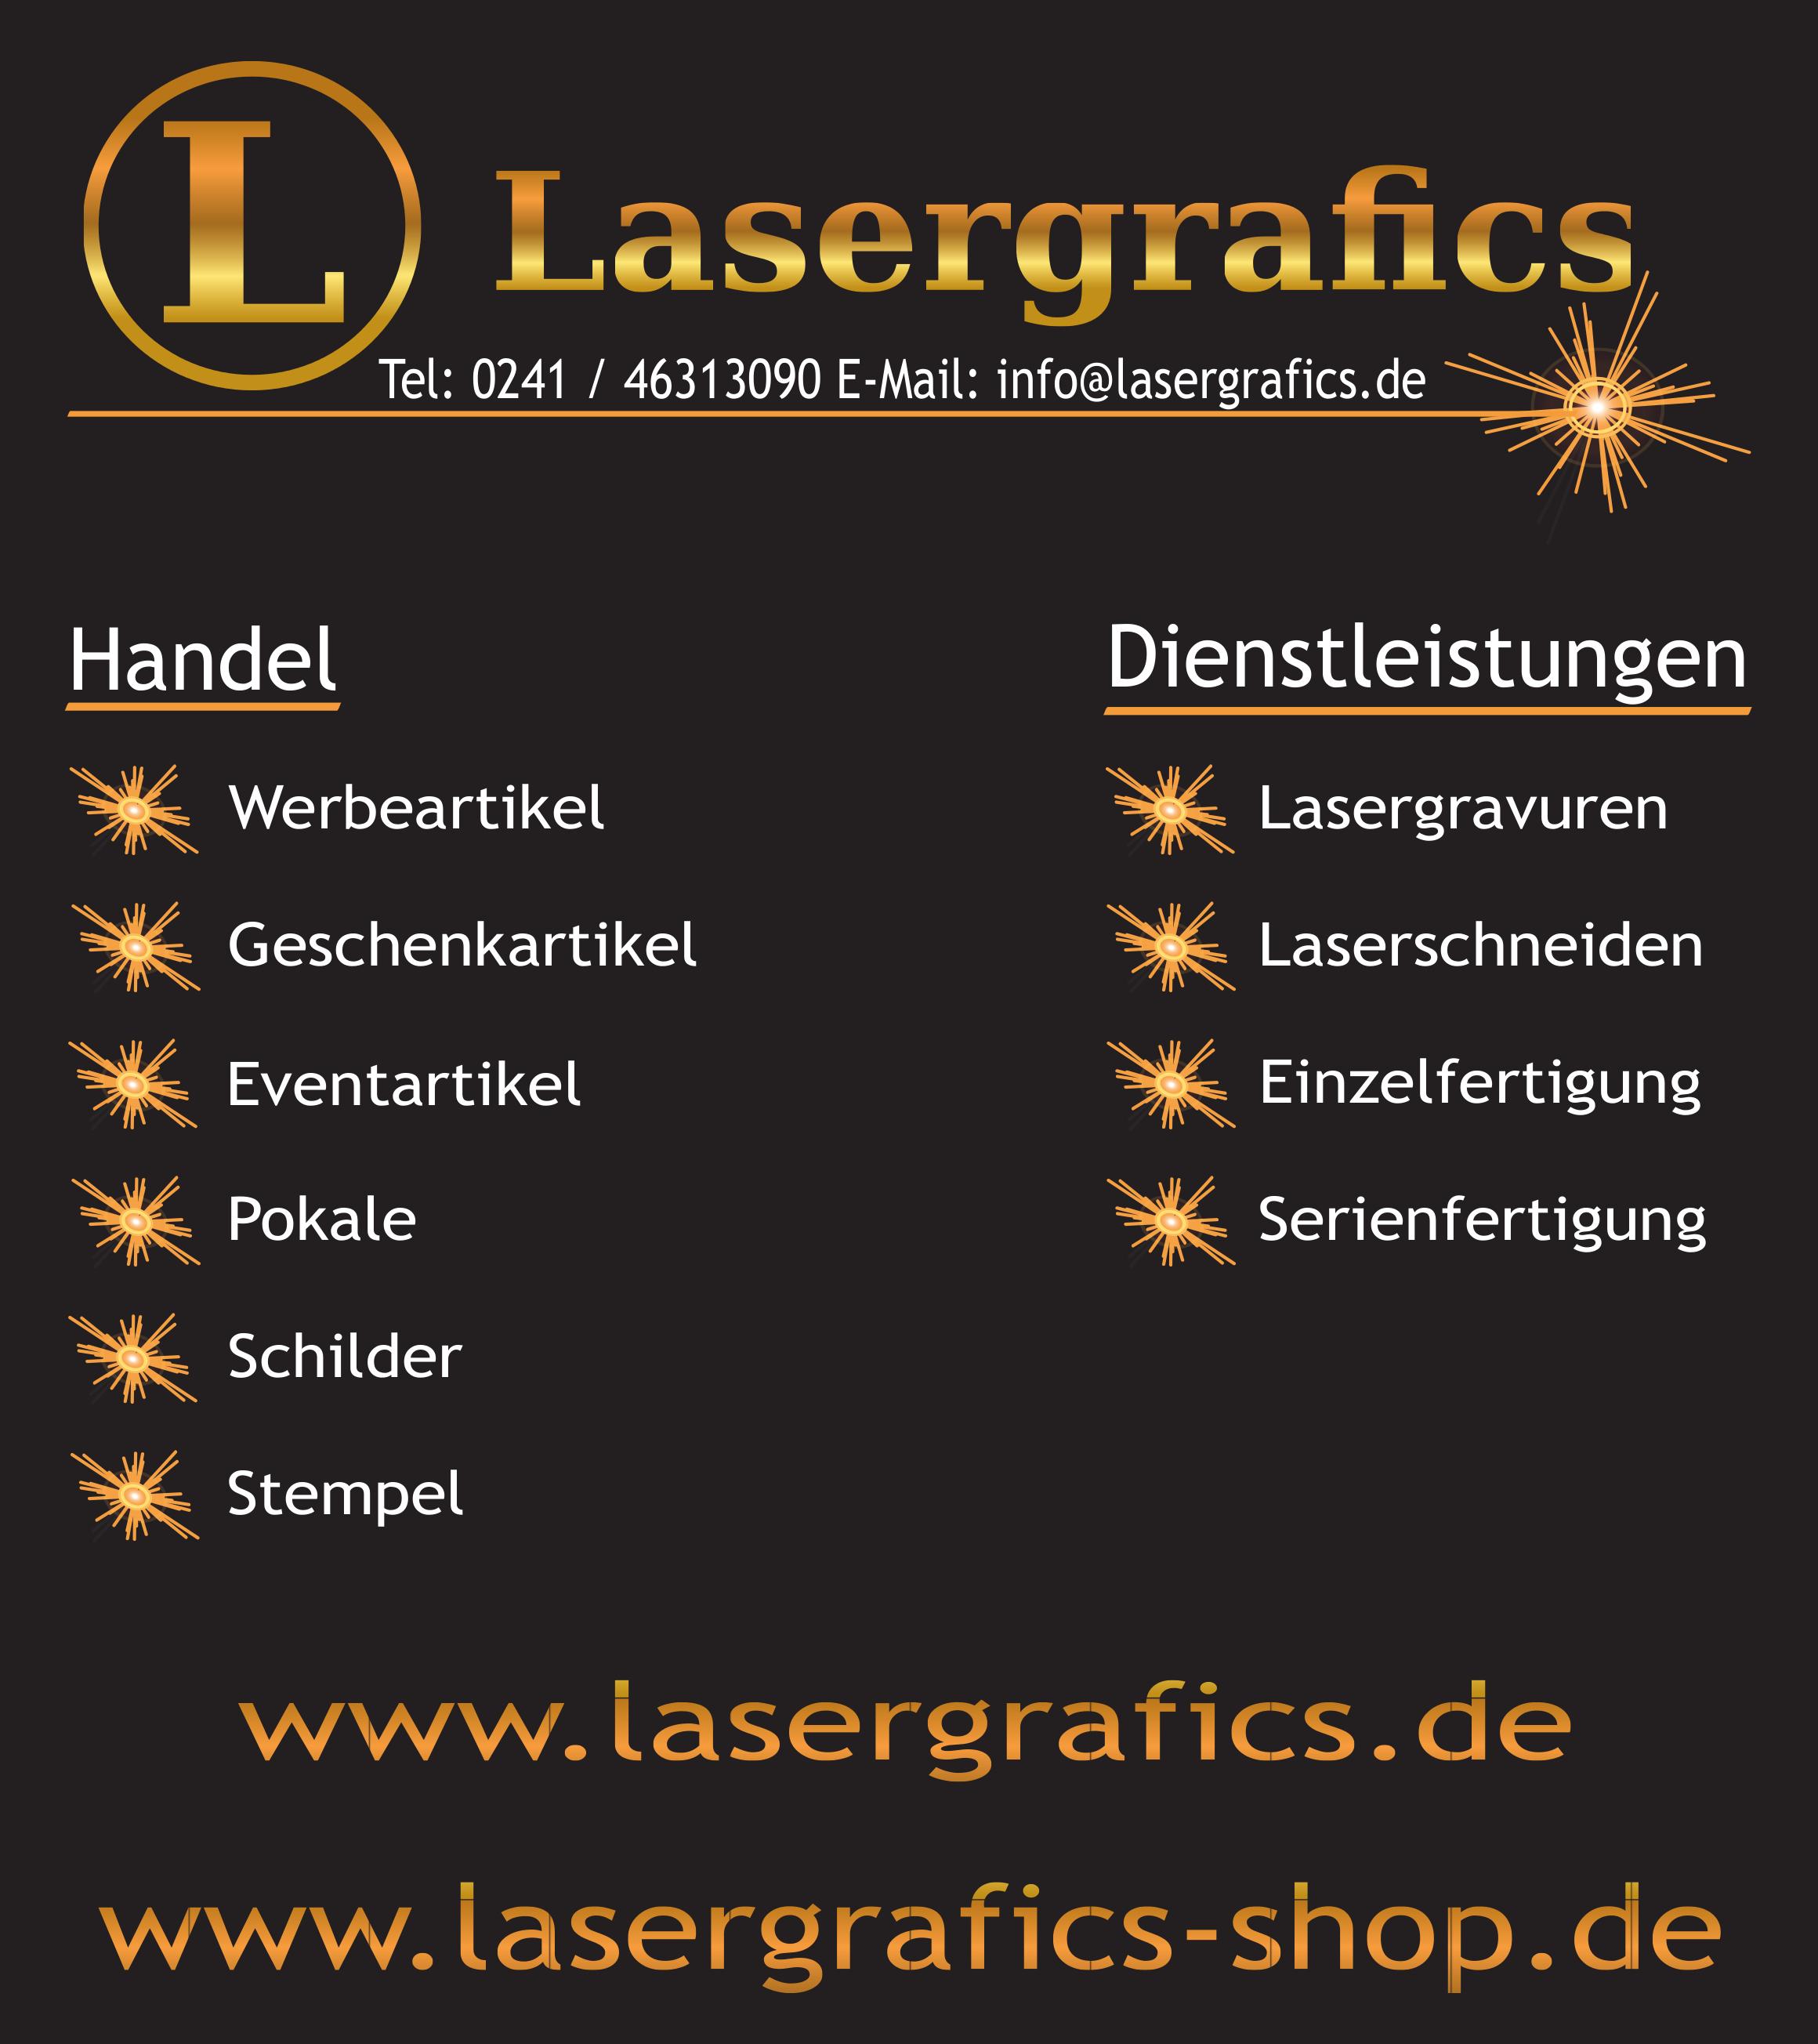 AW Lasergrafics